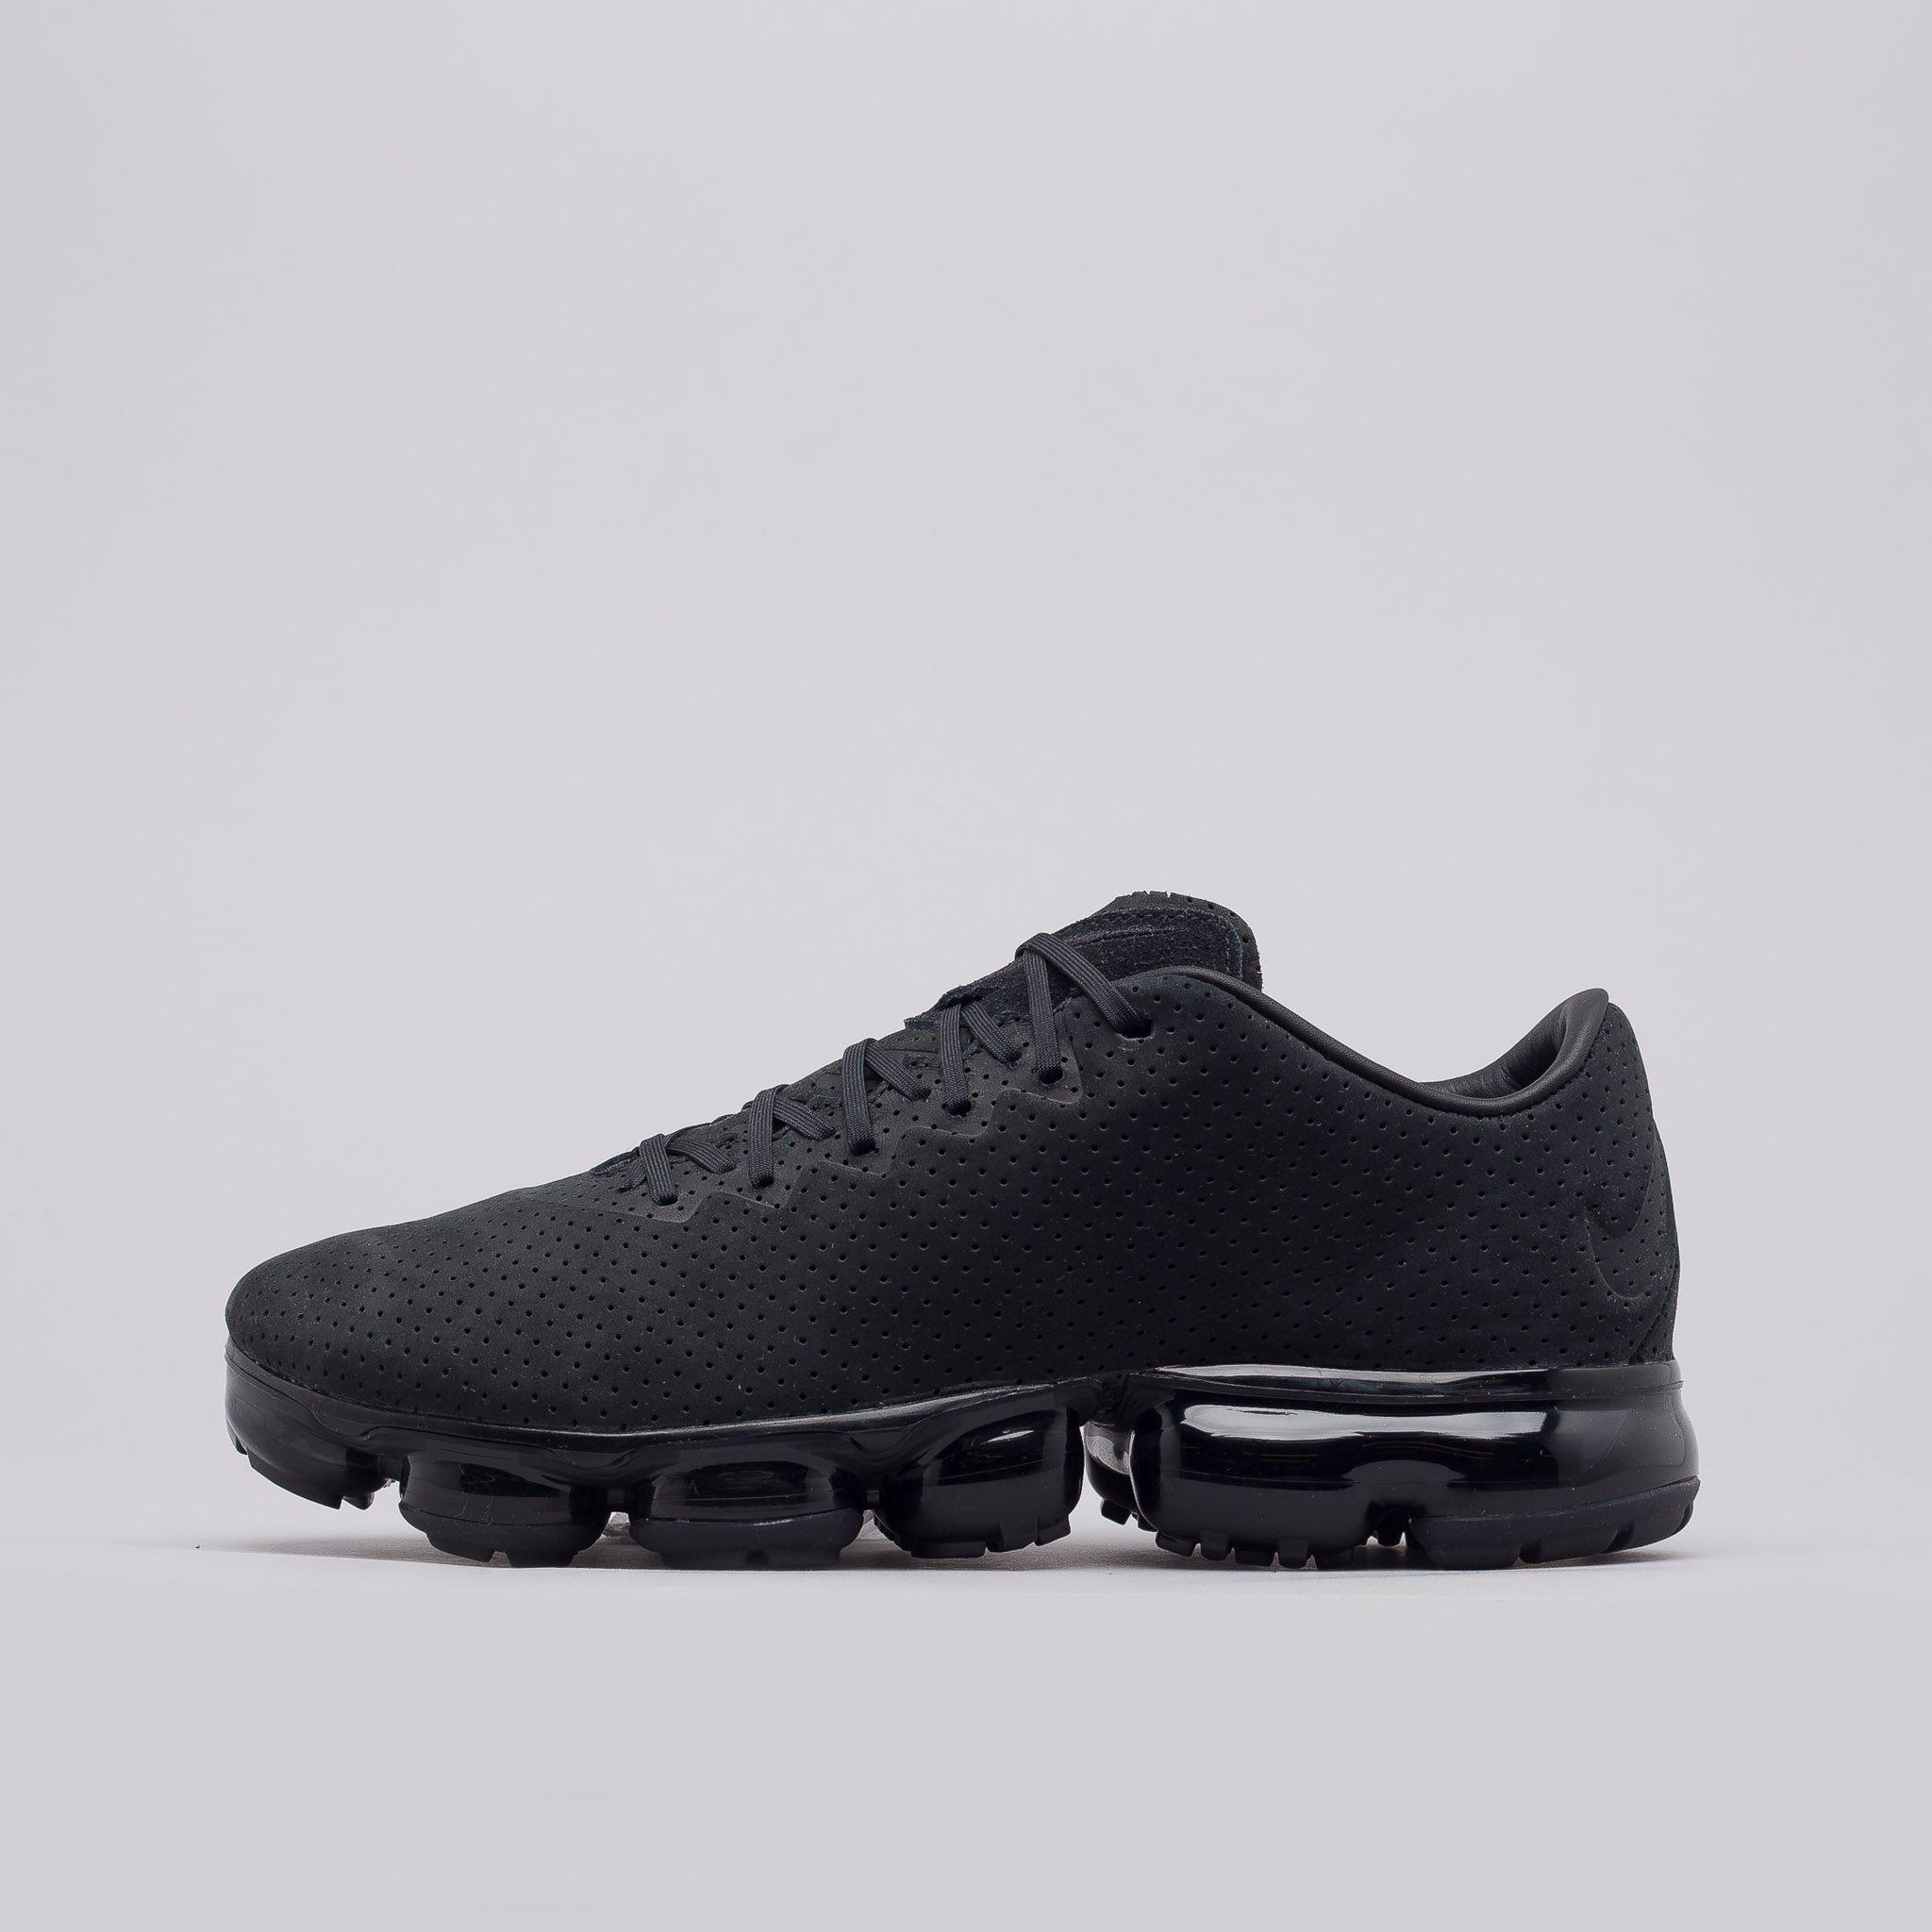 9e737f0edd7ef Lyst - Nike Air Vapormax Ltr In Black in Black for Men